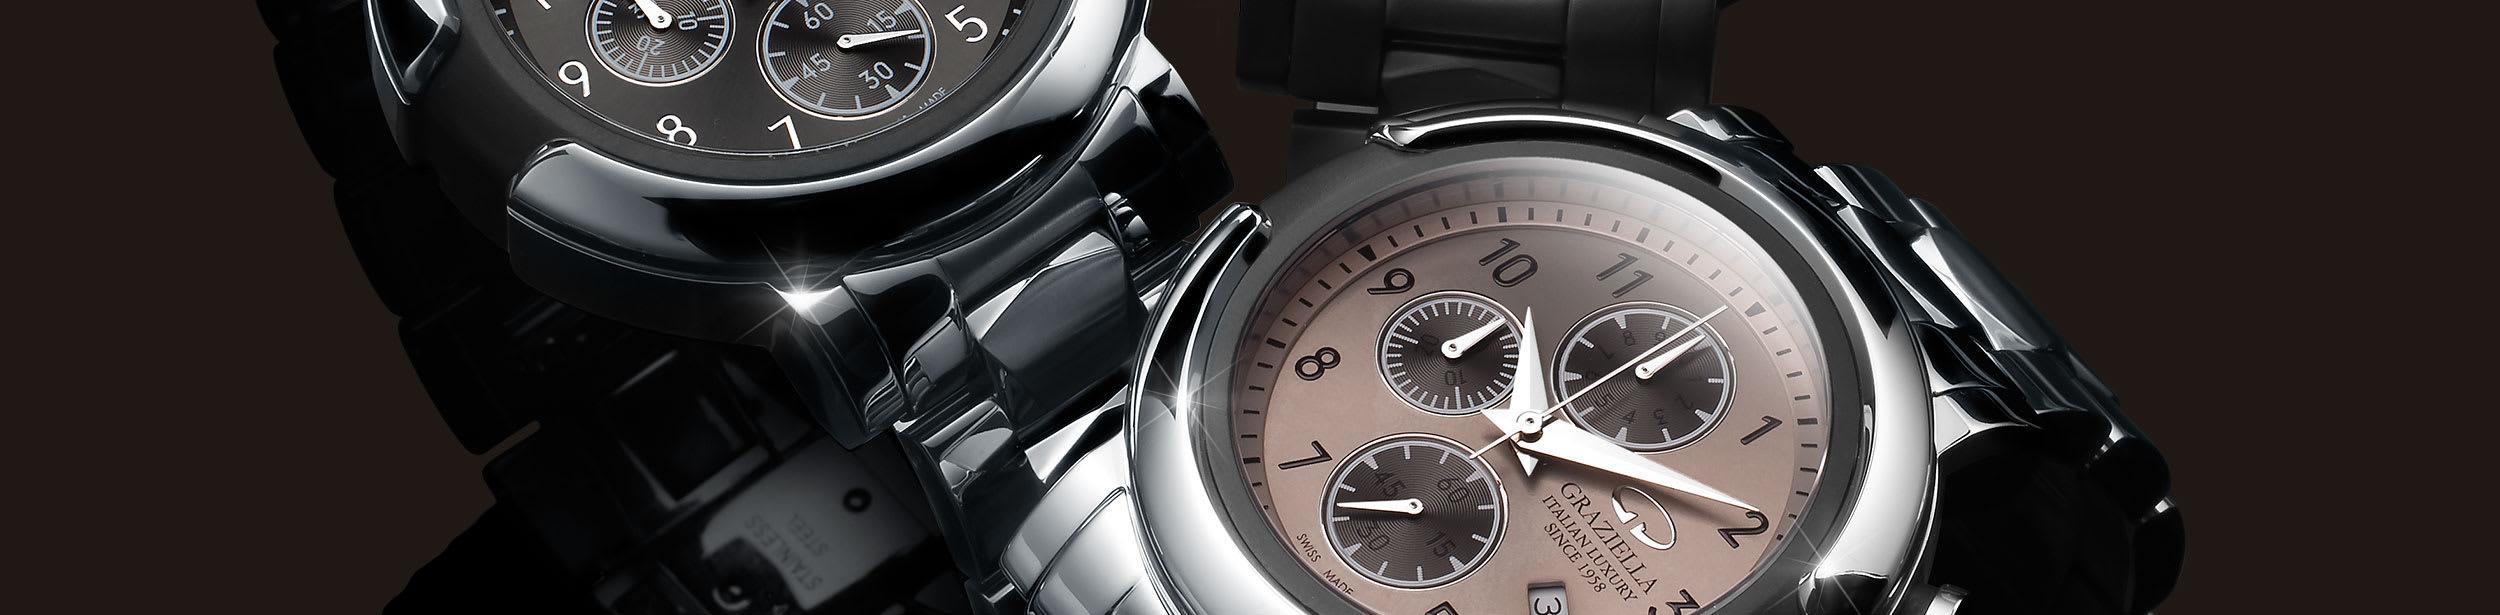 Automatice Graziella Metal watch